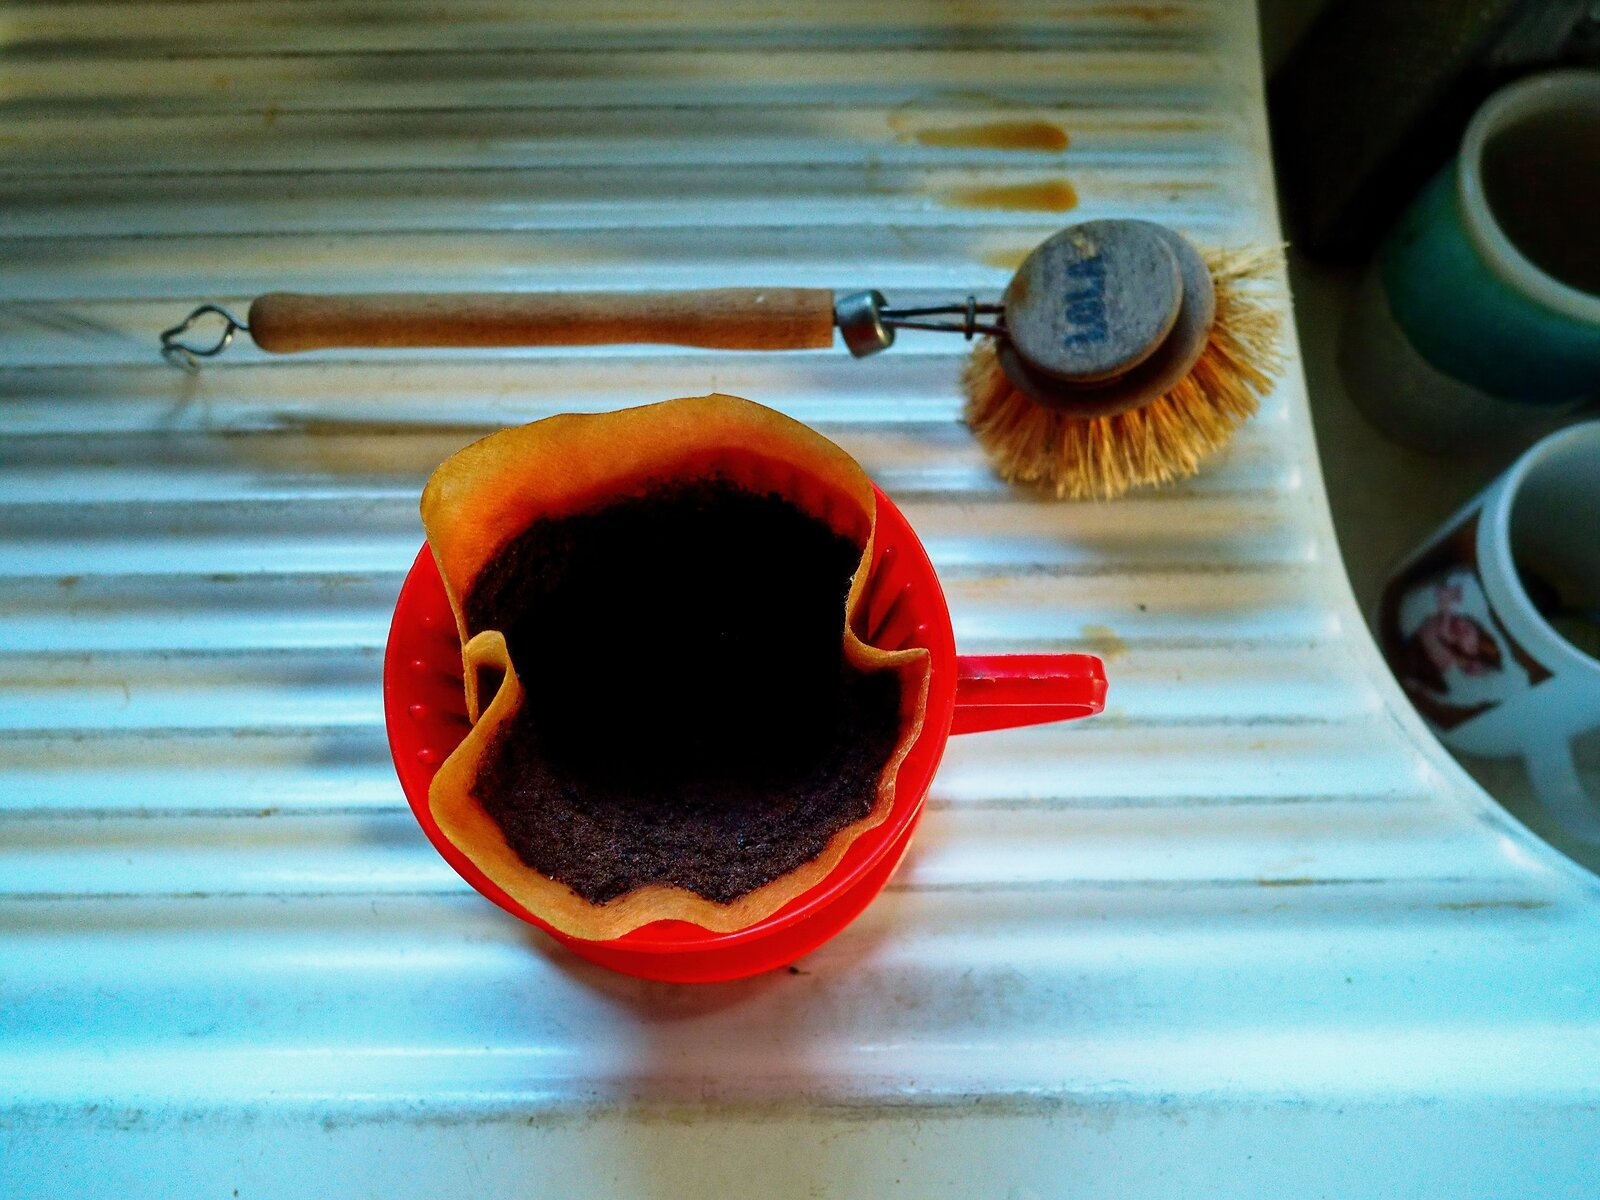 PenF_Jan7_21_coffee_filter.jpg